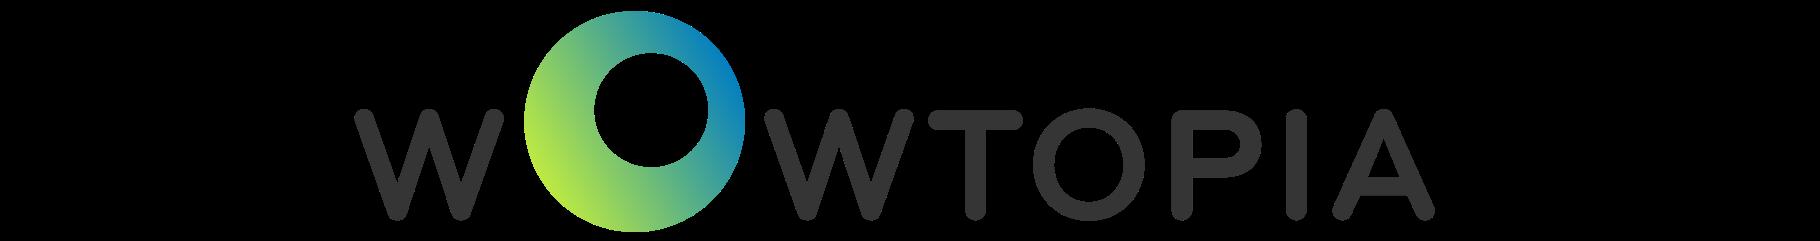 Wowtopia New Logo-3Website.png